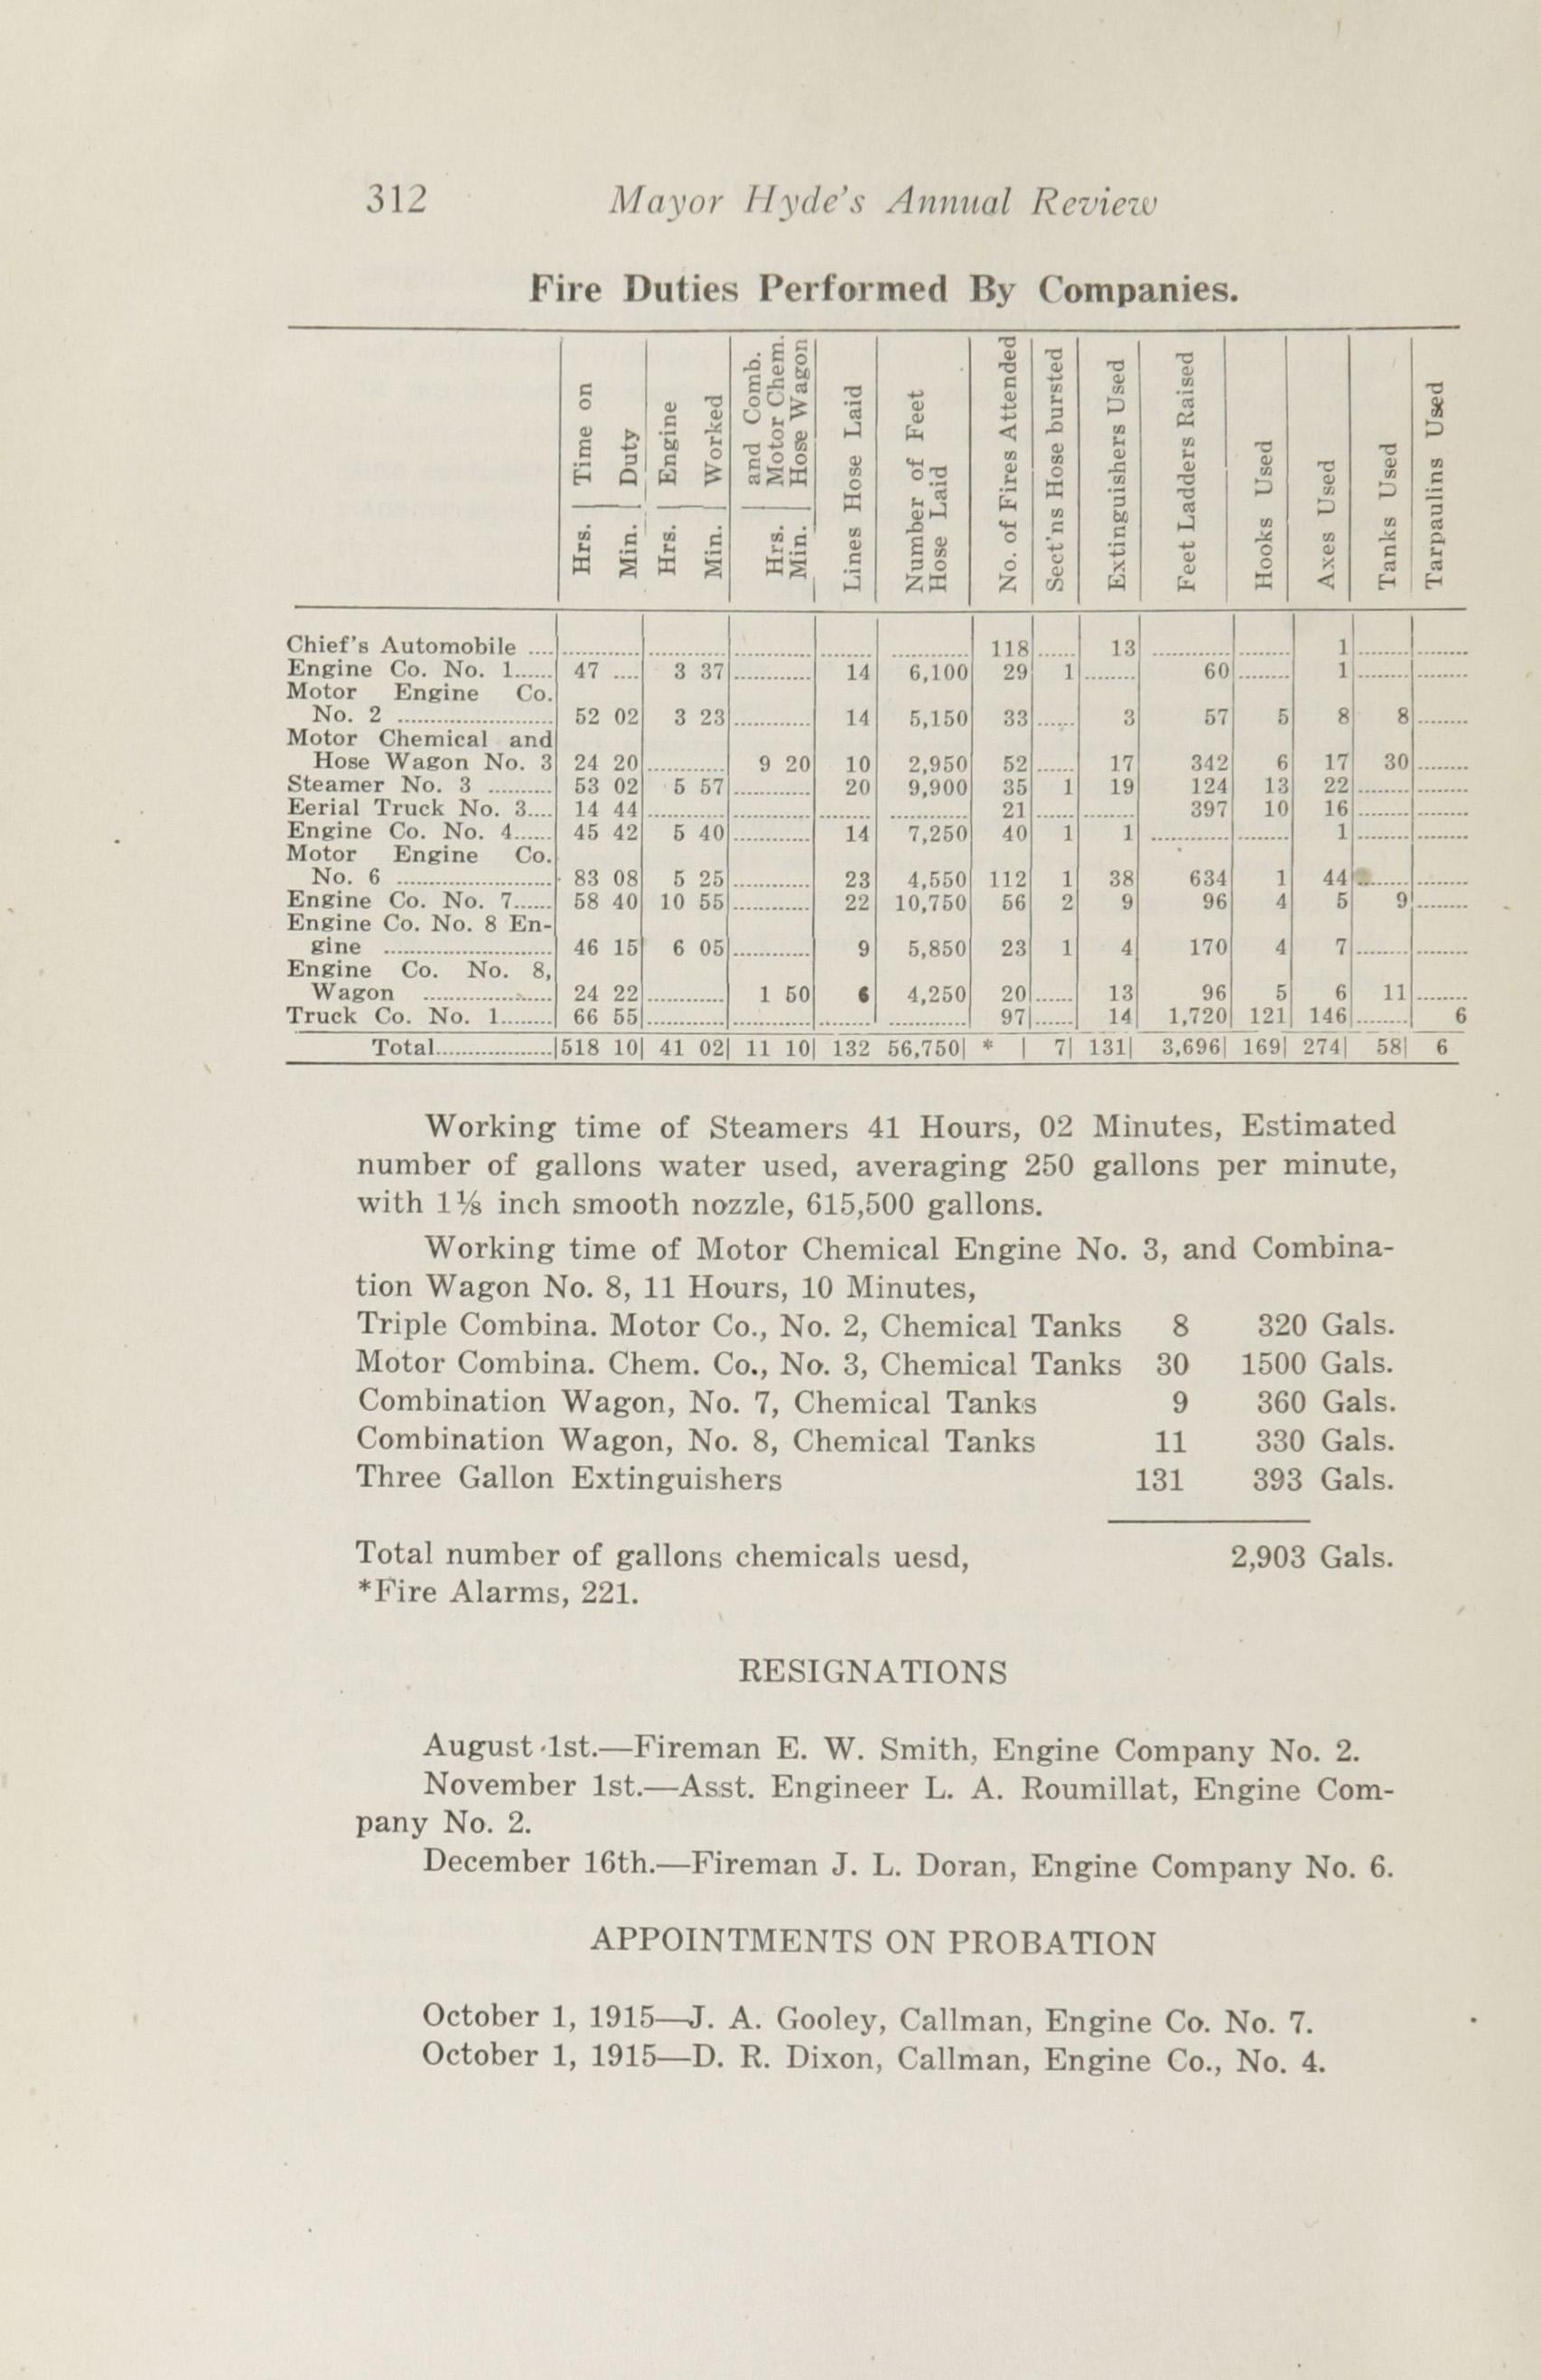 Charleston Yearbook, 1916, page 312